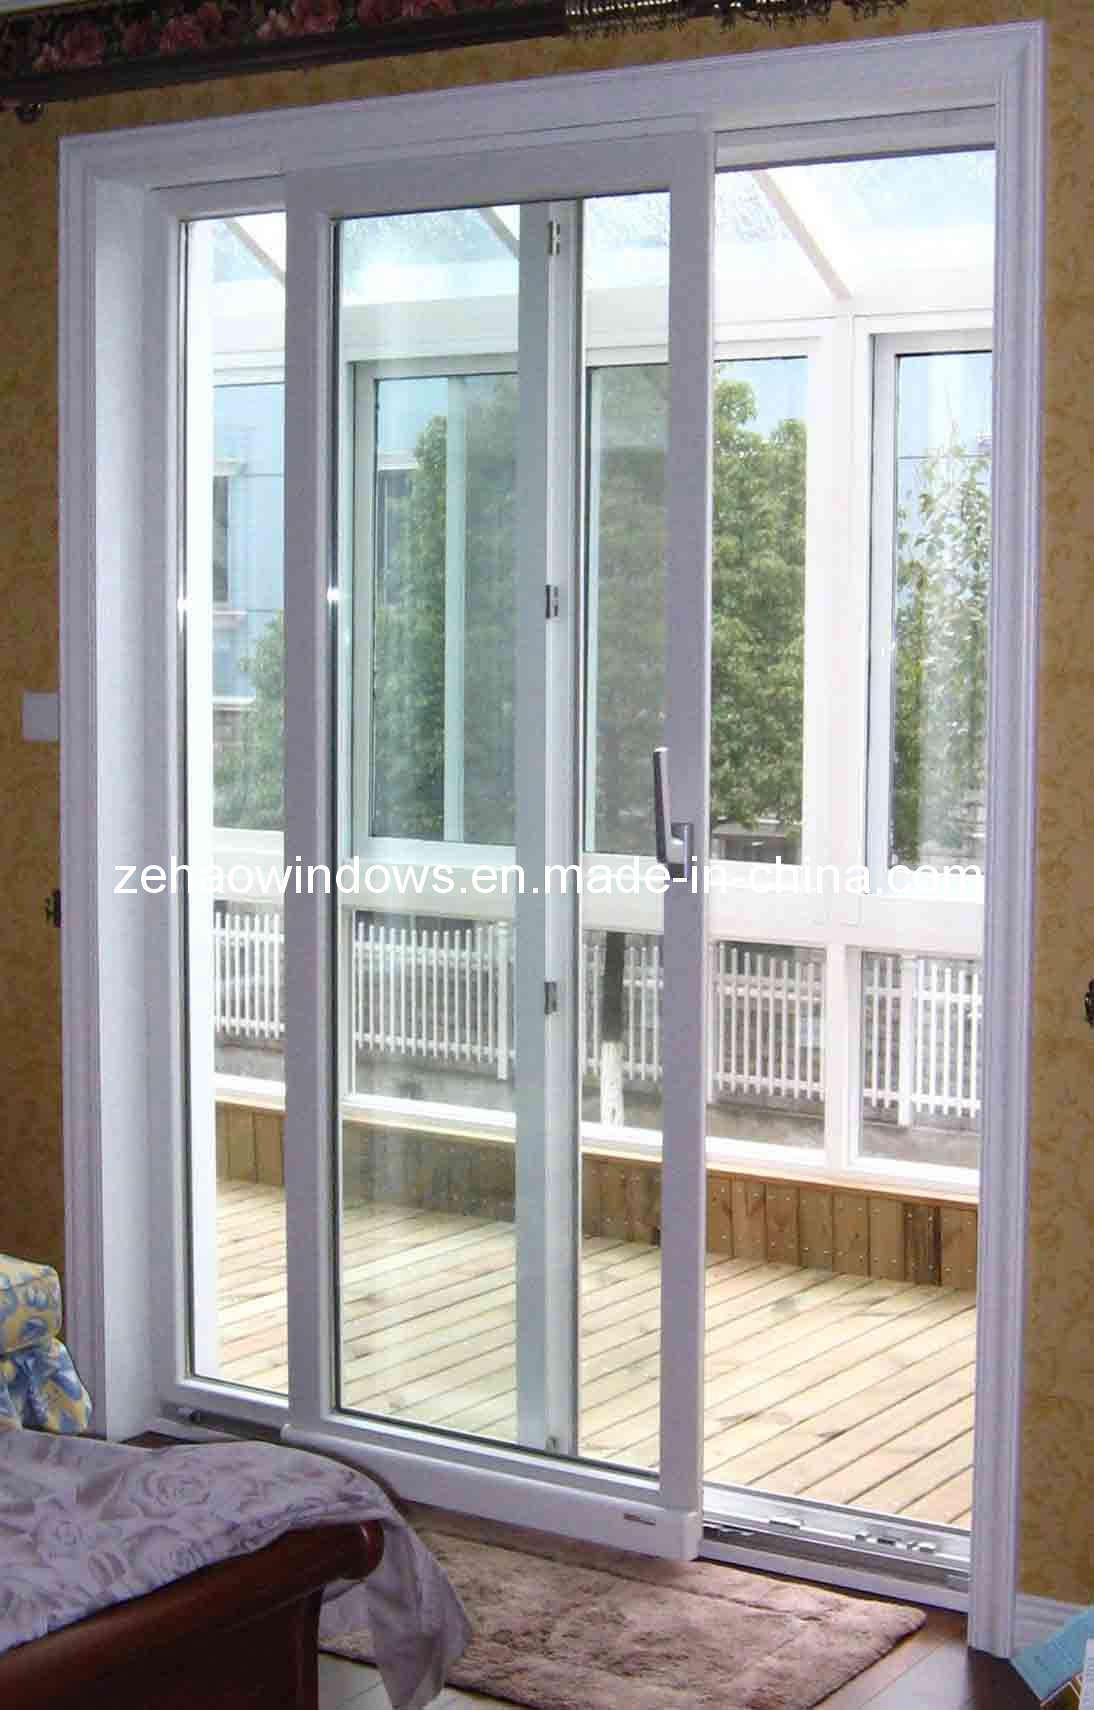 1710 #614930 PVC Doors UPVC Doors ZH STD 003 .jpg image Pvc Sliding Doors 2731094